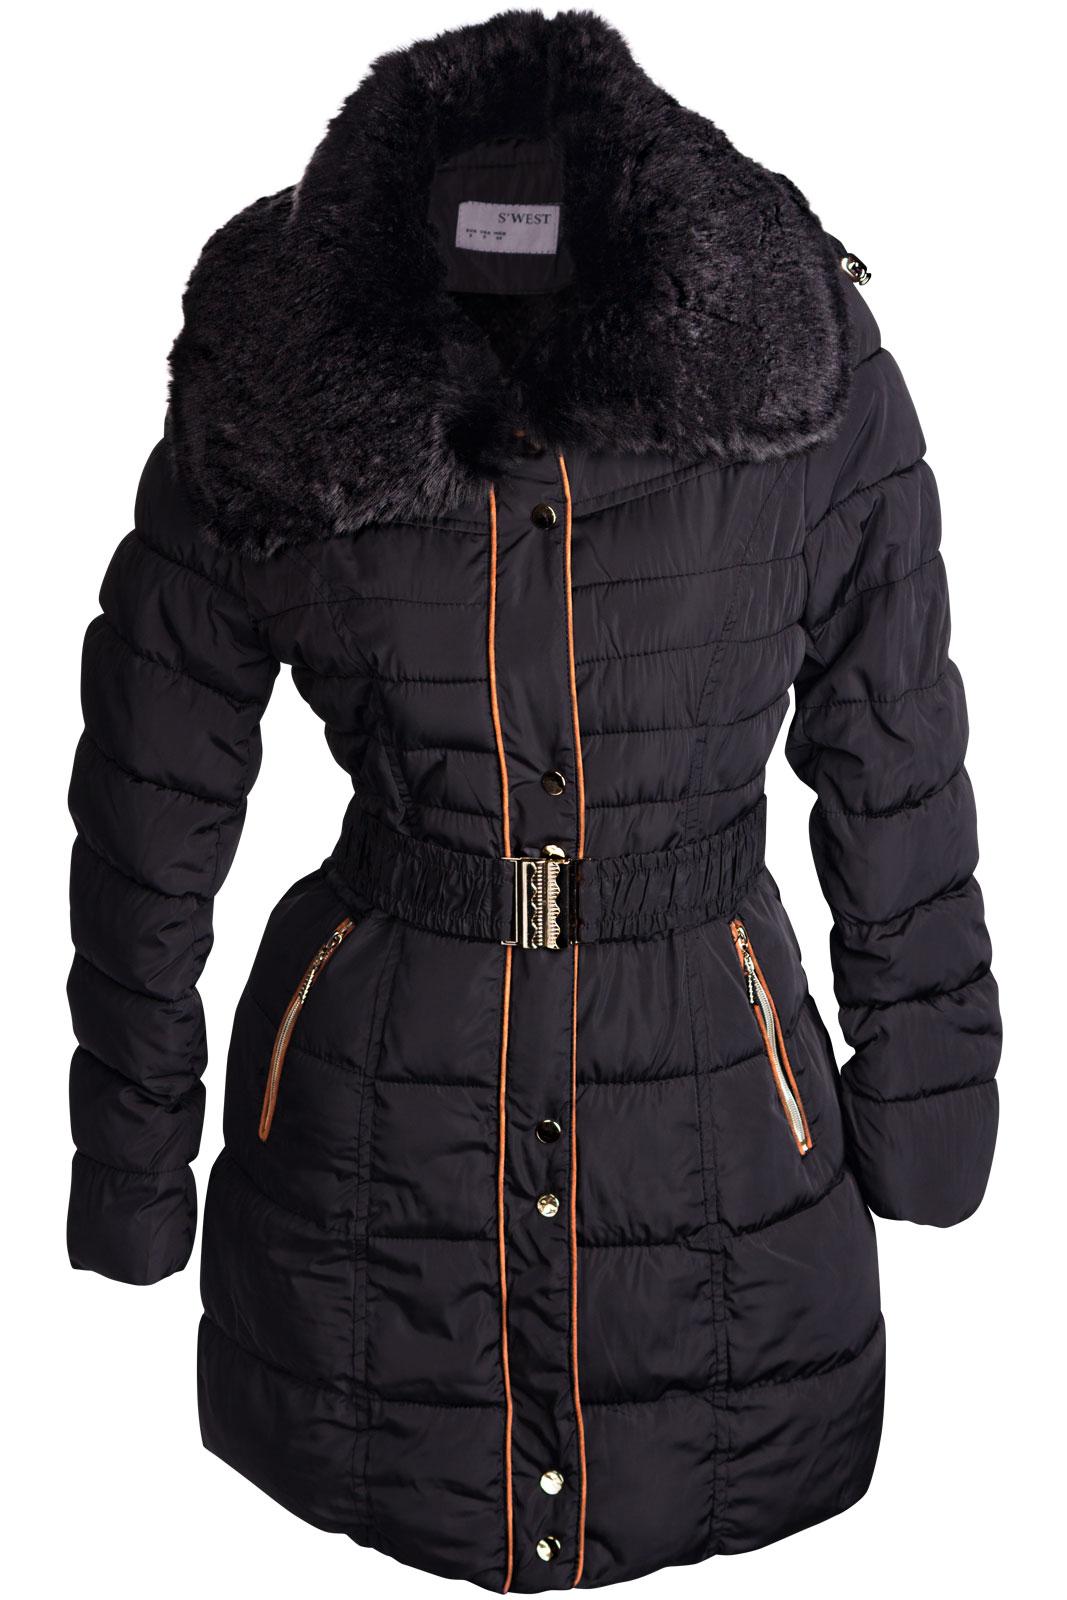 neu damen winter mantel stepp jacke parka lang fell kapuze. Black Bedroom Furniture Sets. Home Design Ideas